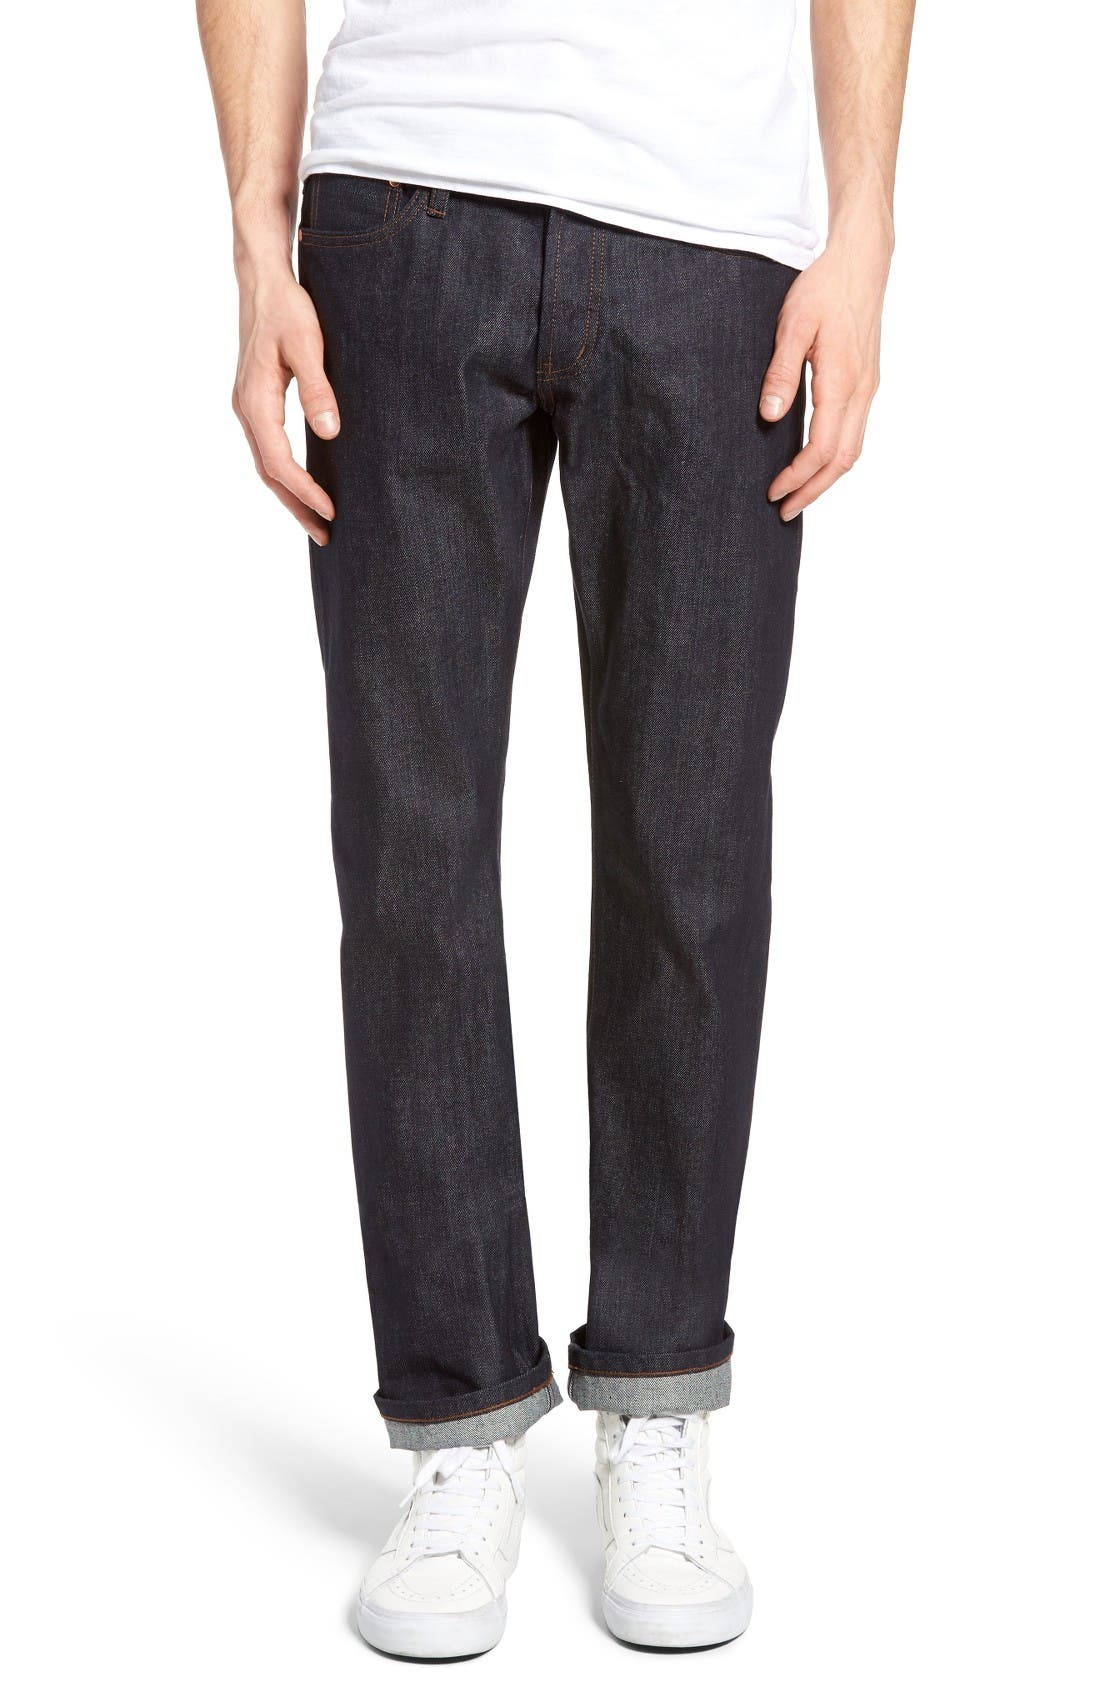 Alternate Image 1 Selected - The Unbranded Brand UB301 Straight Leg Raw Selvedge Jeans (Indigo)